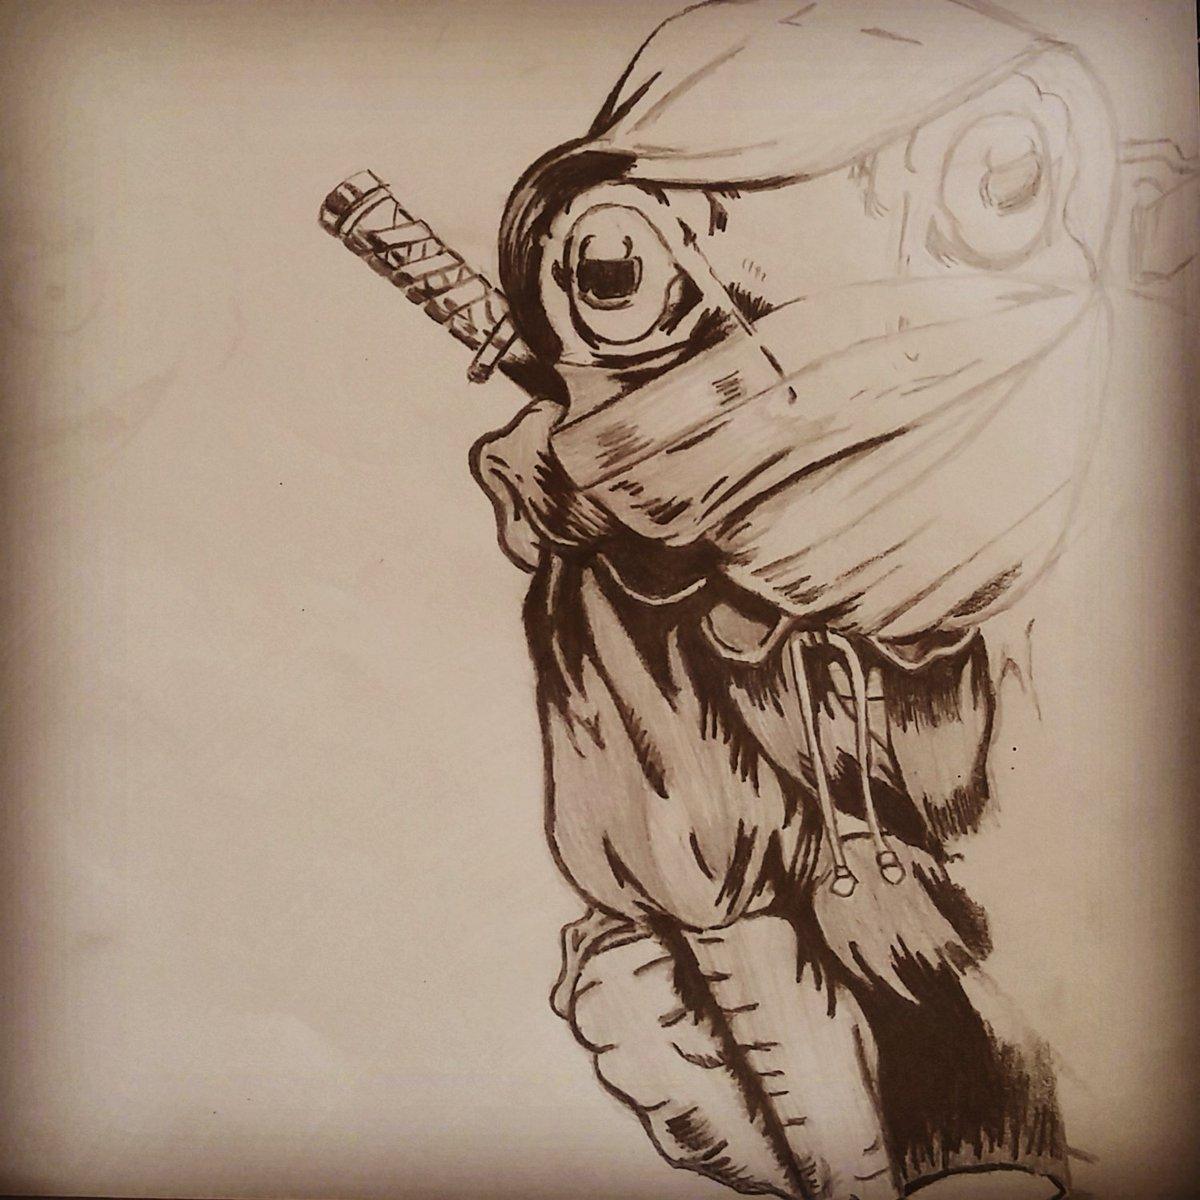 Jj on twitter art arts ninja sketches sketch draw drawing ilovetodraw pencilsketch artbook juststartingout newtothis shading pencilshading